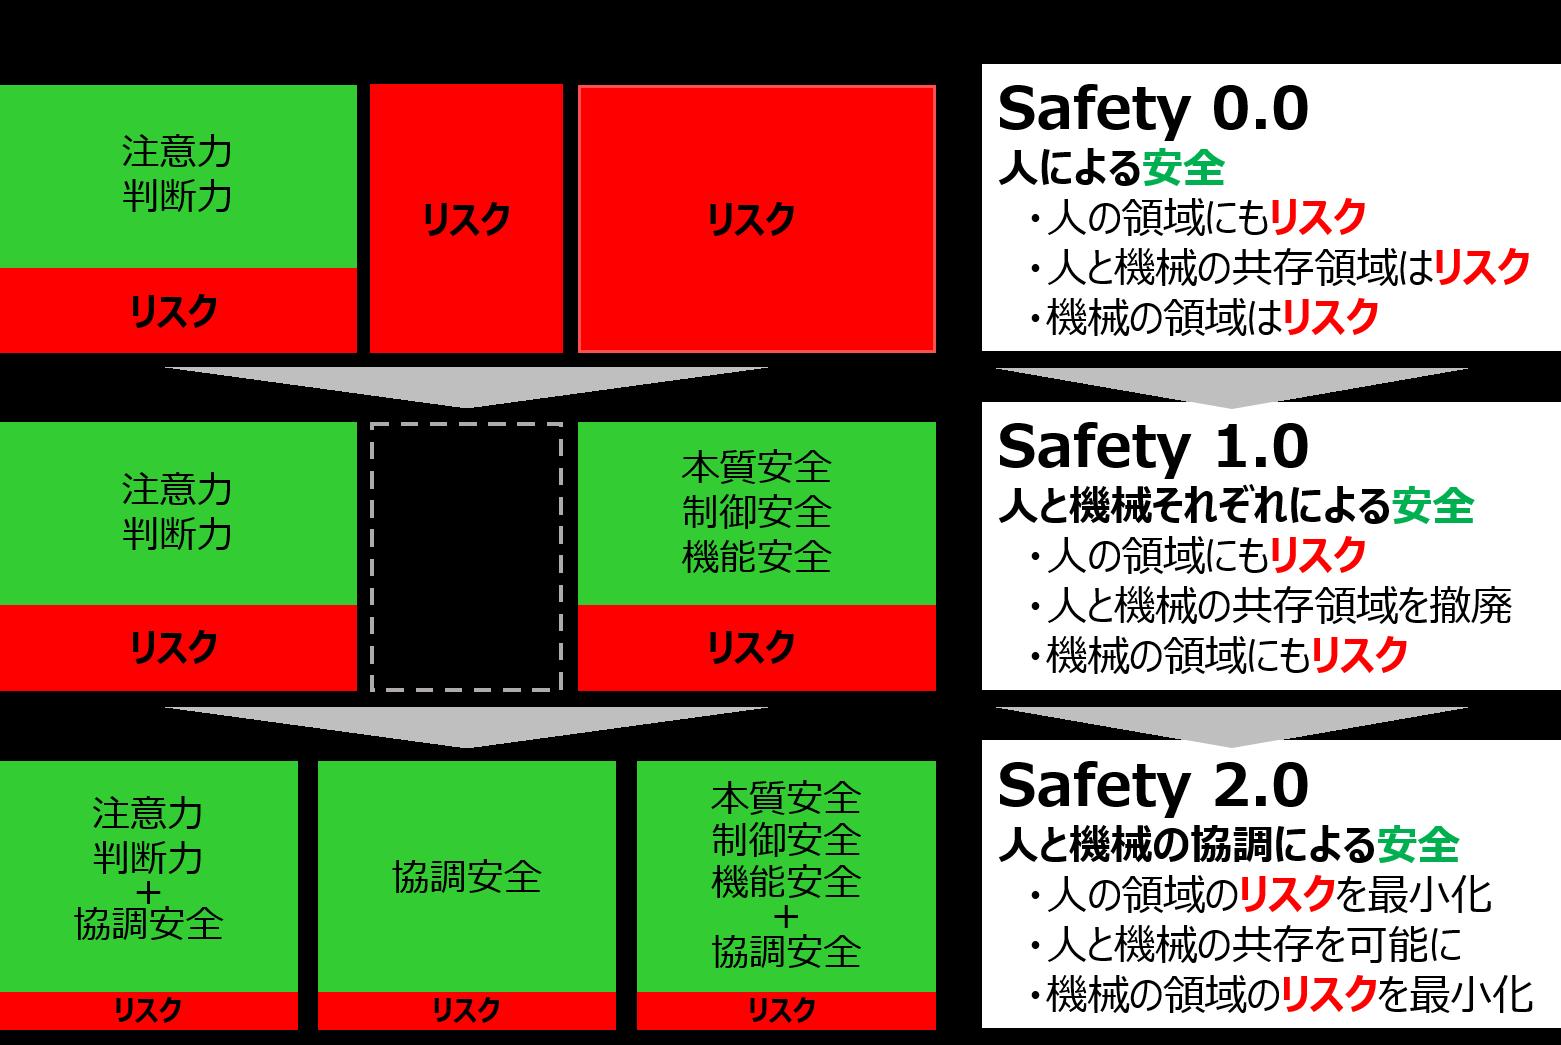 Safety2.0とは